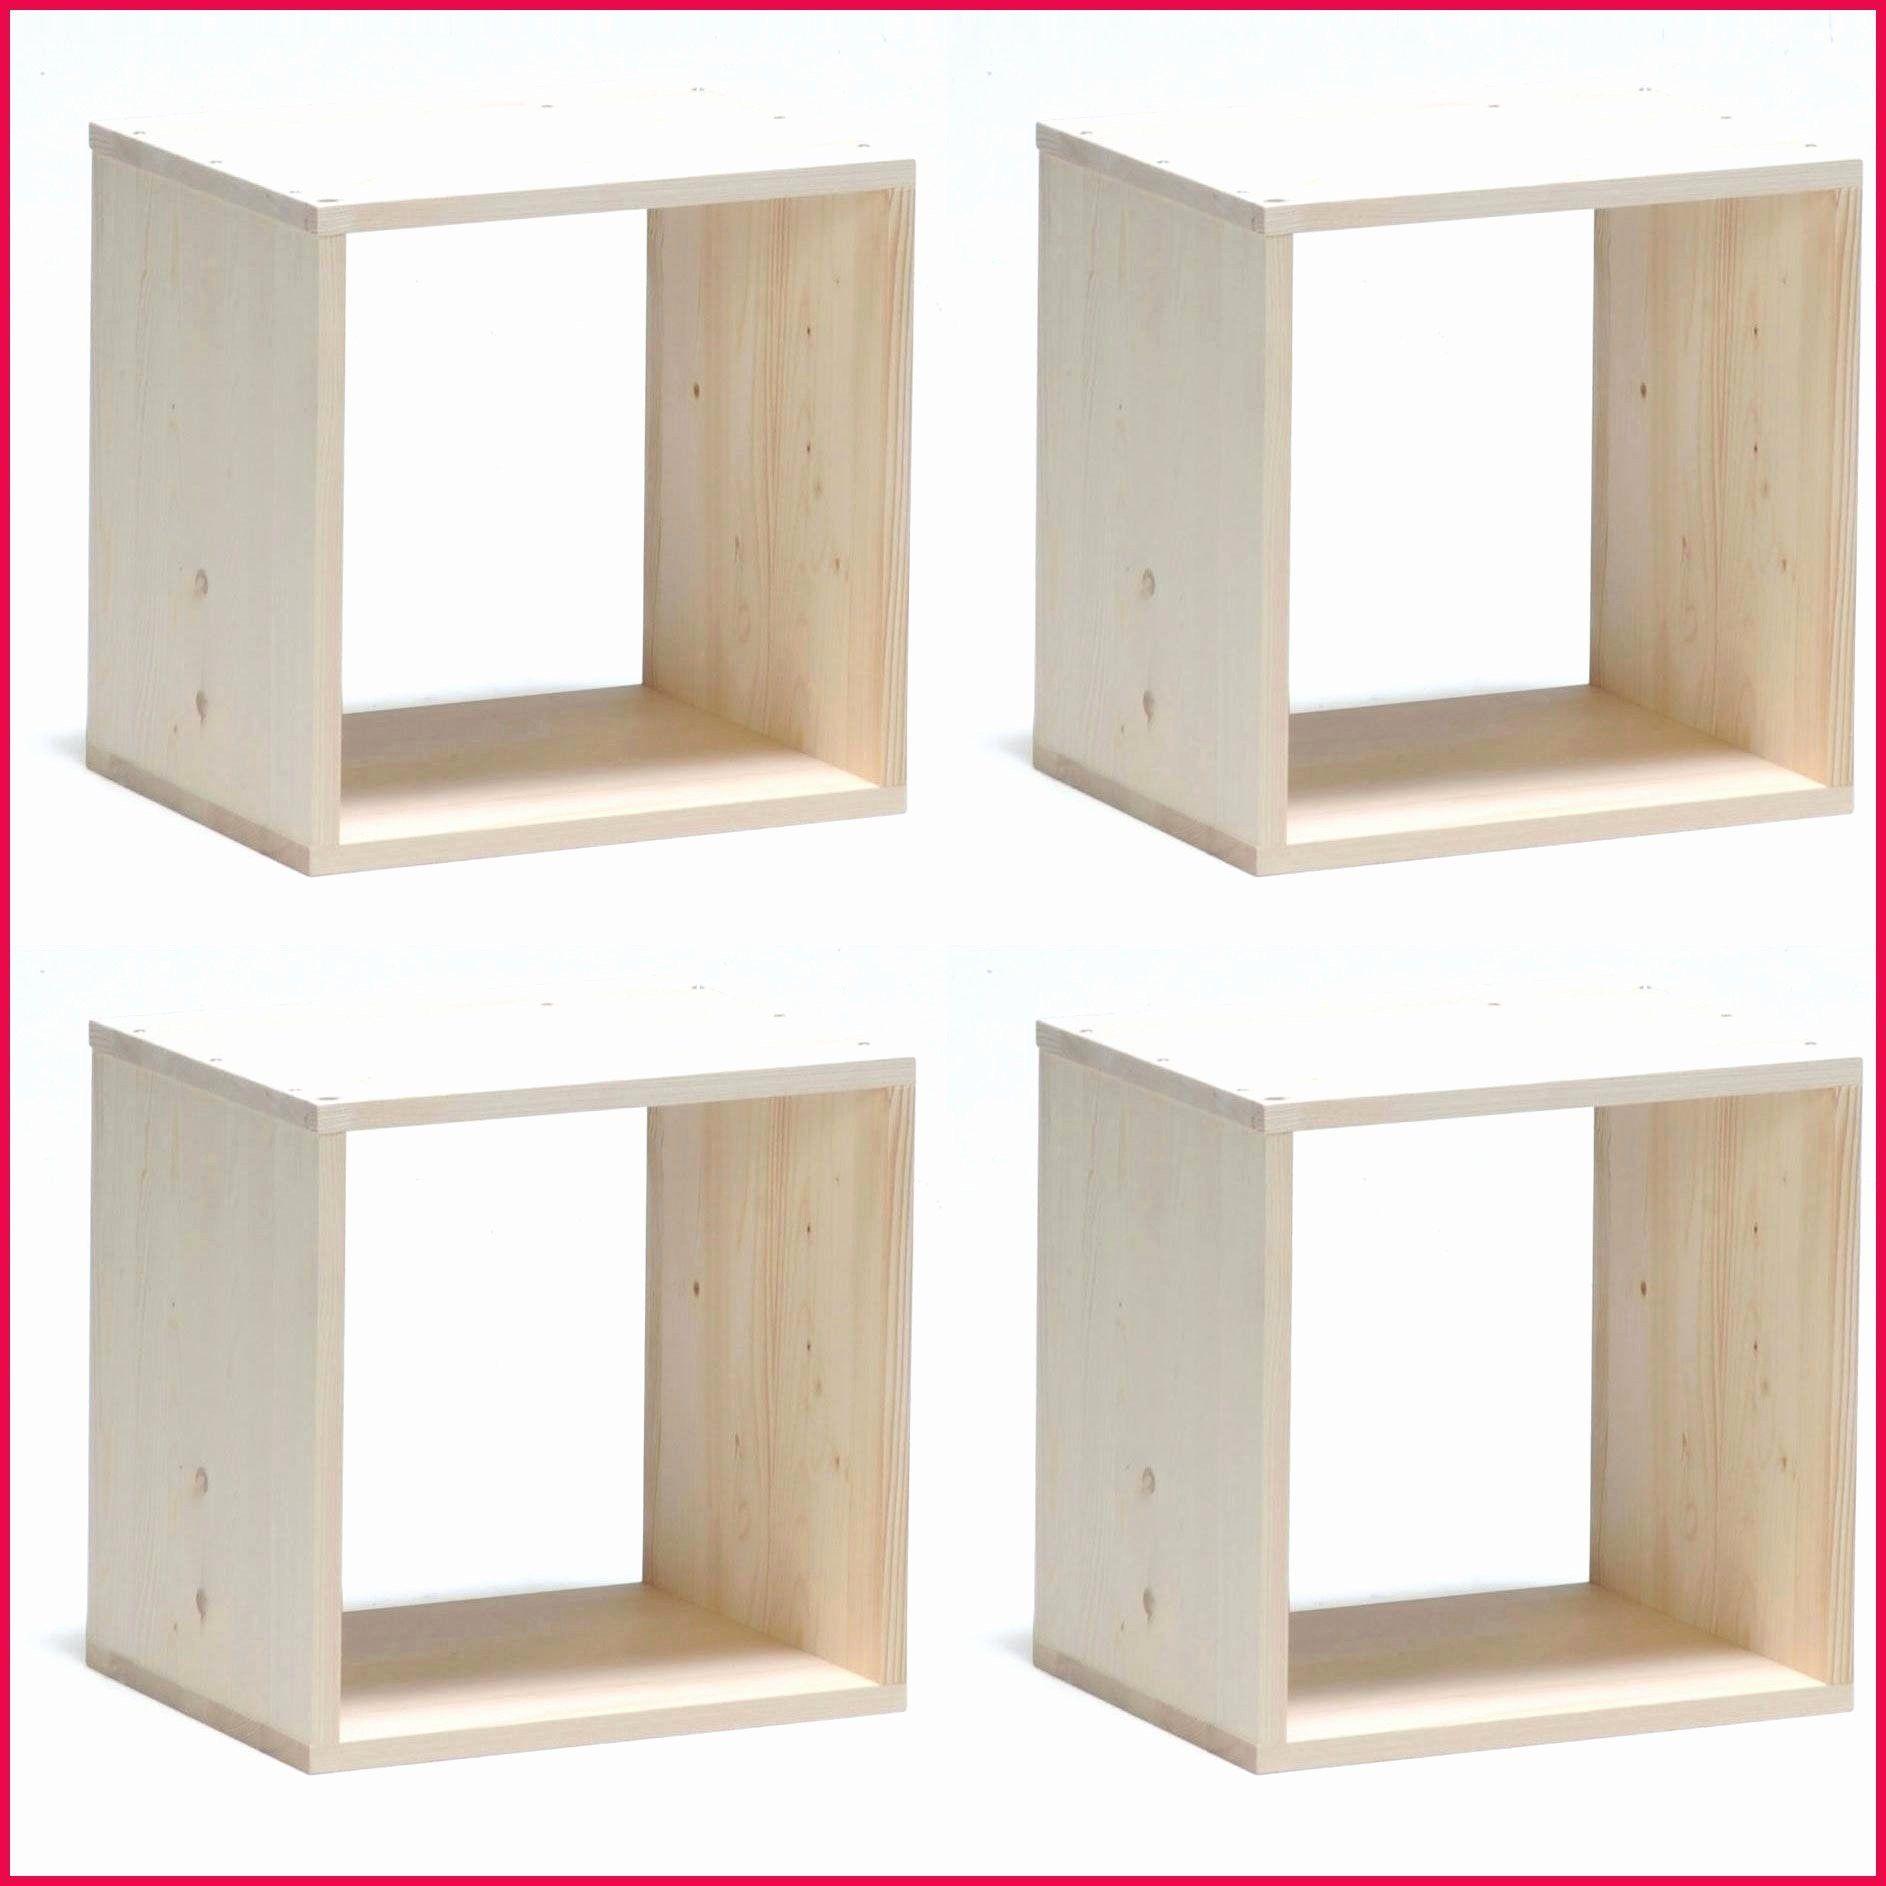 Inspirational Support Mural Tv Castorama Armoire Rangement Etagere Bois Meuble De Bureau Ikea